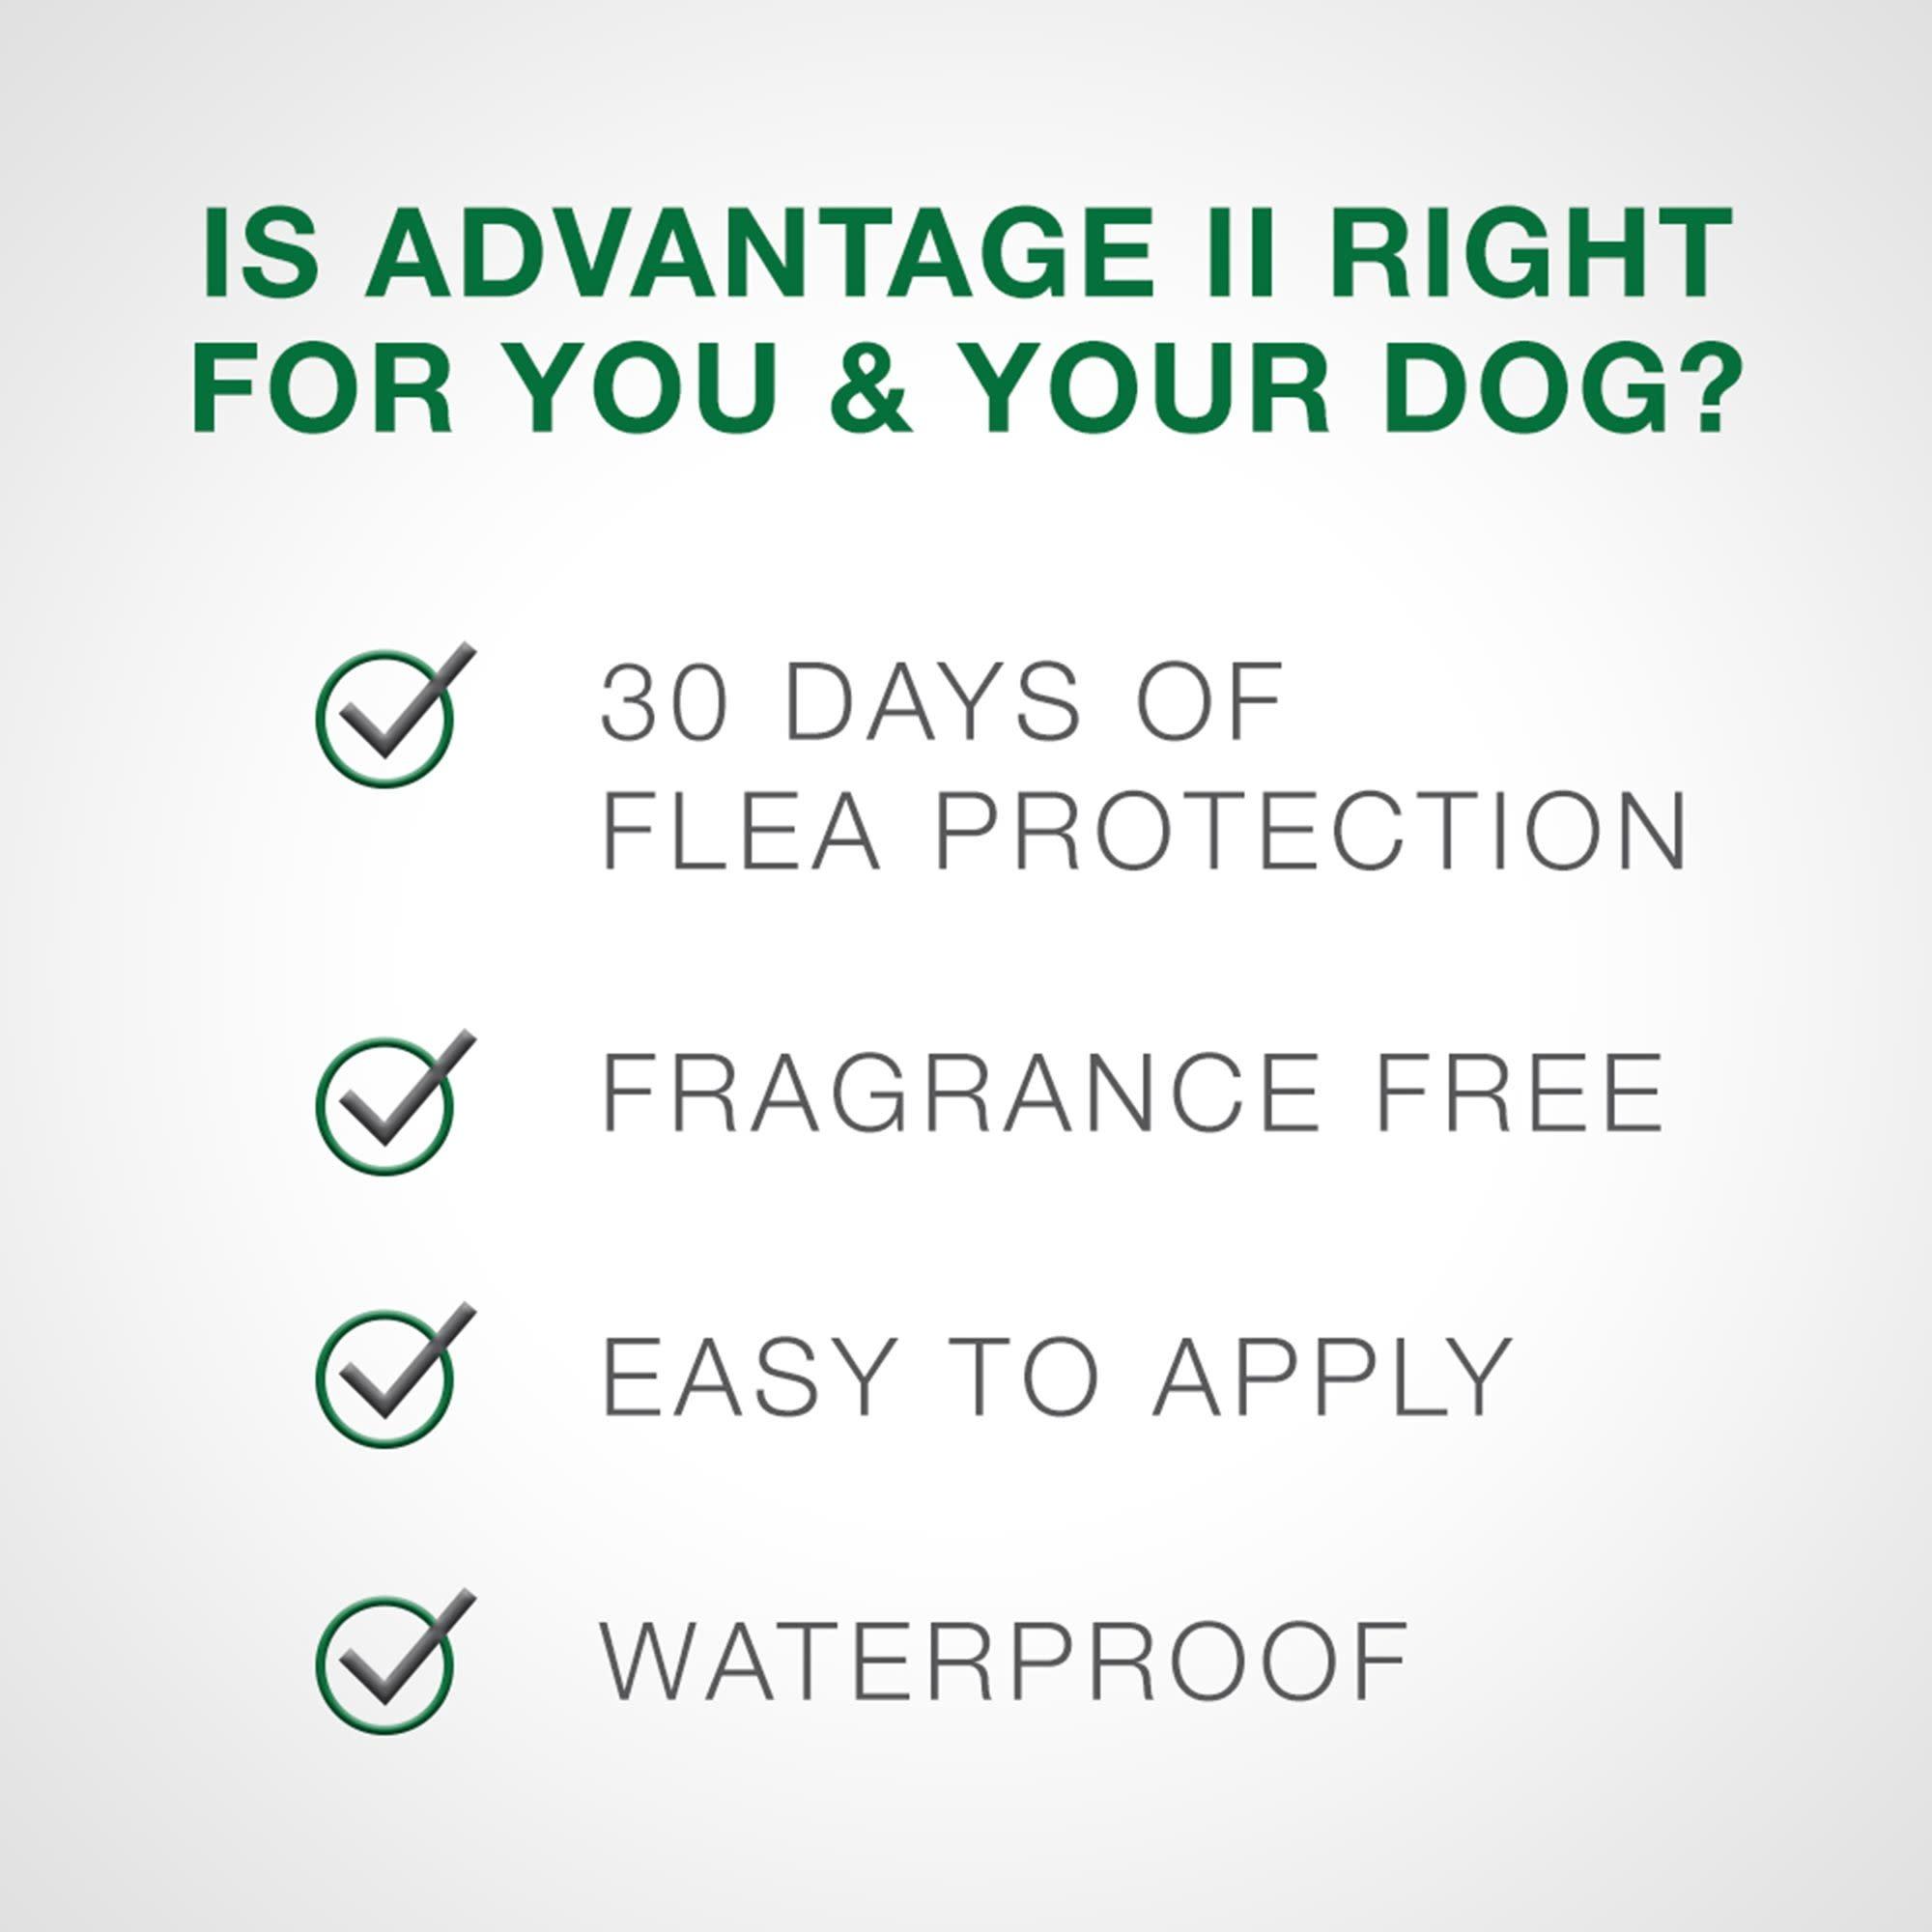 Advantage (Bayer) Advantage II Large Dog, 6 Pack